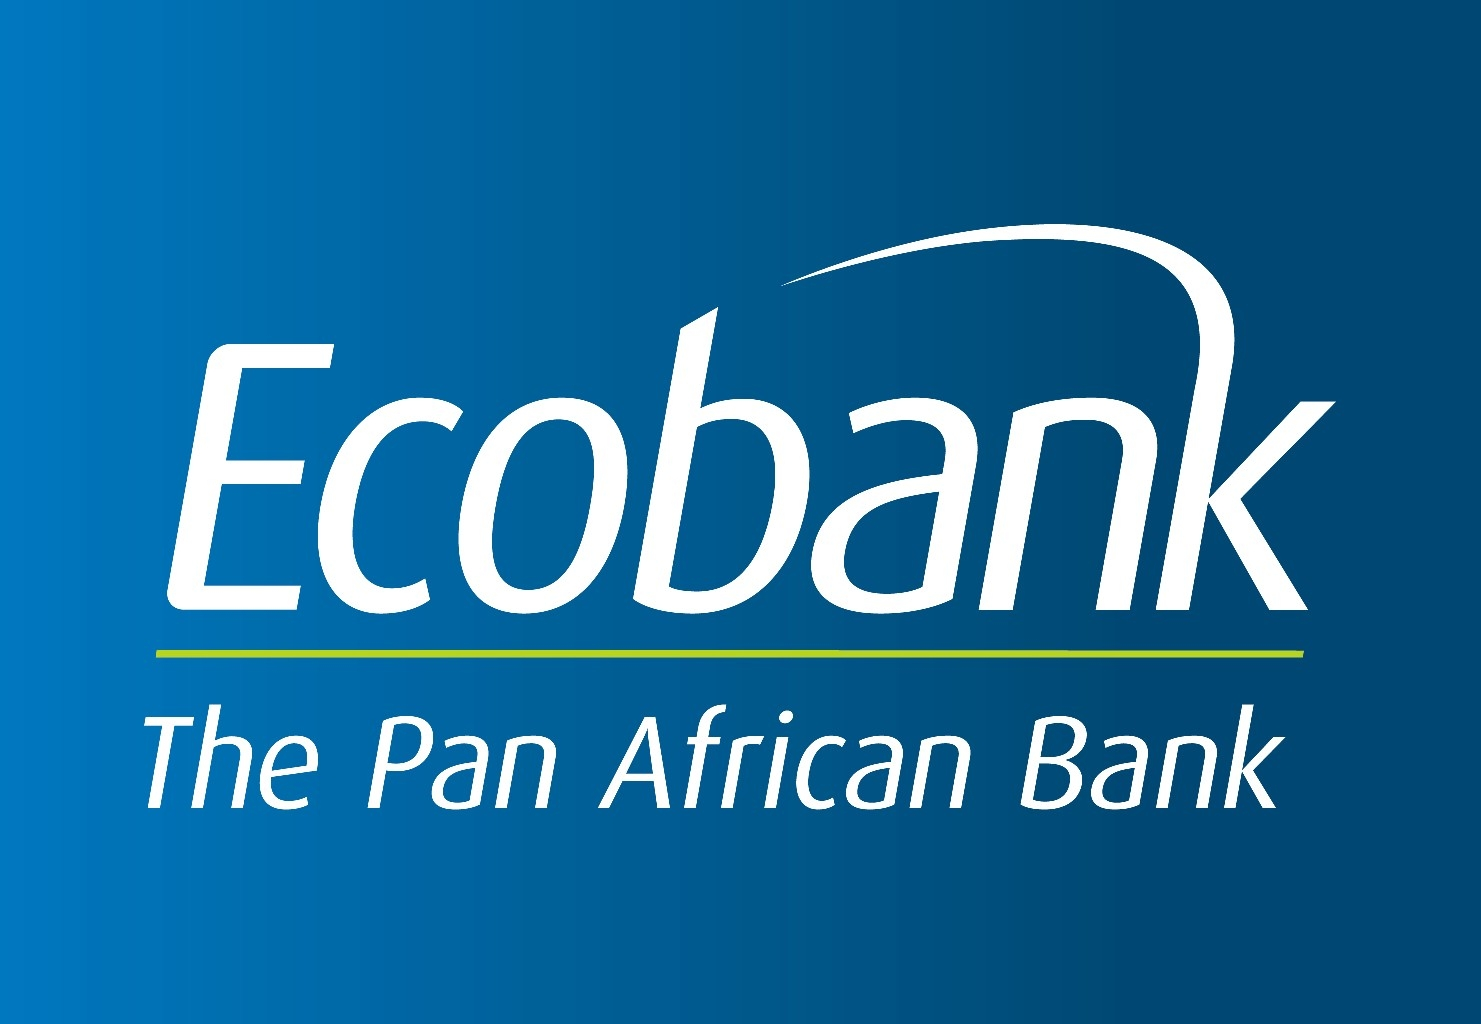 11.Ecobank